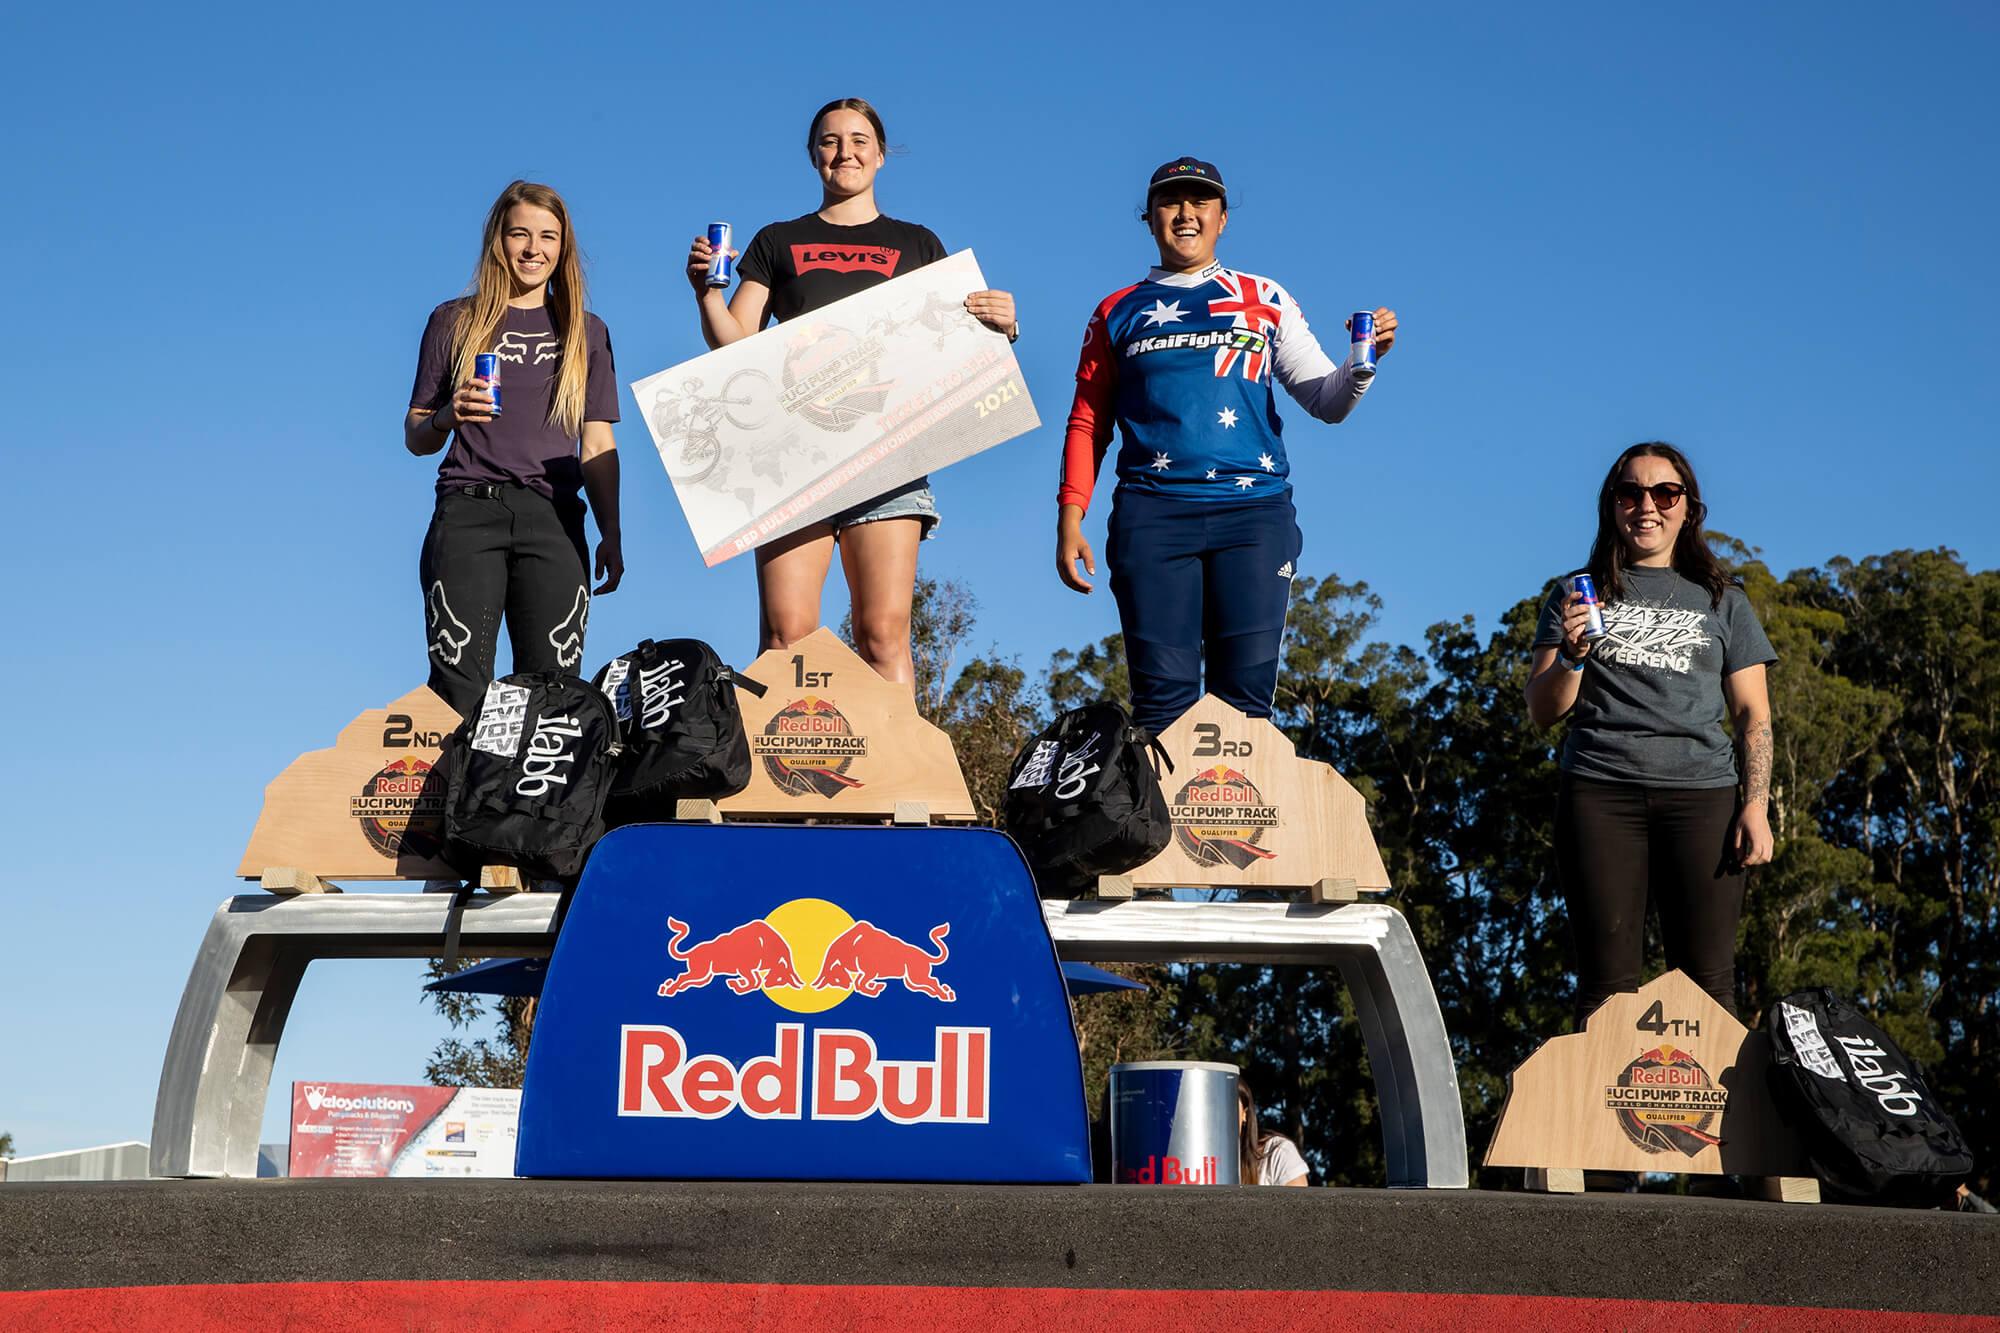 Red Bull Pump Track Cambridge NZ 2021 - Graeme Murray - Womens Podium